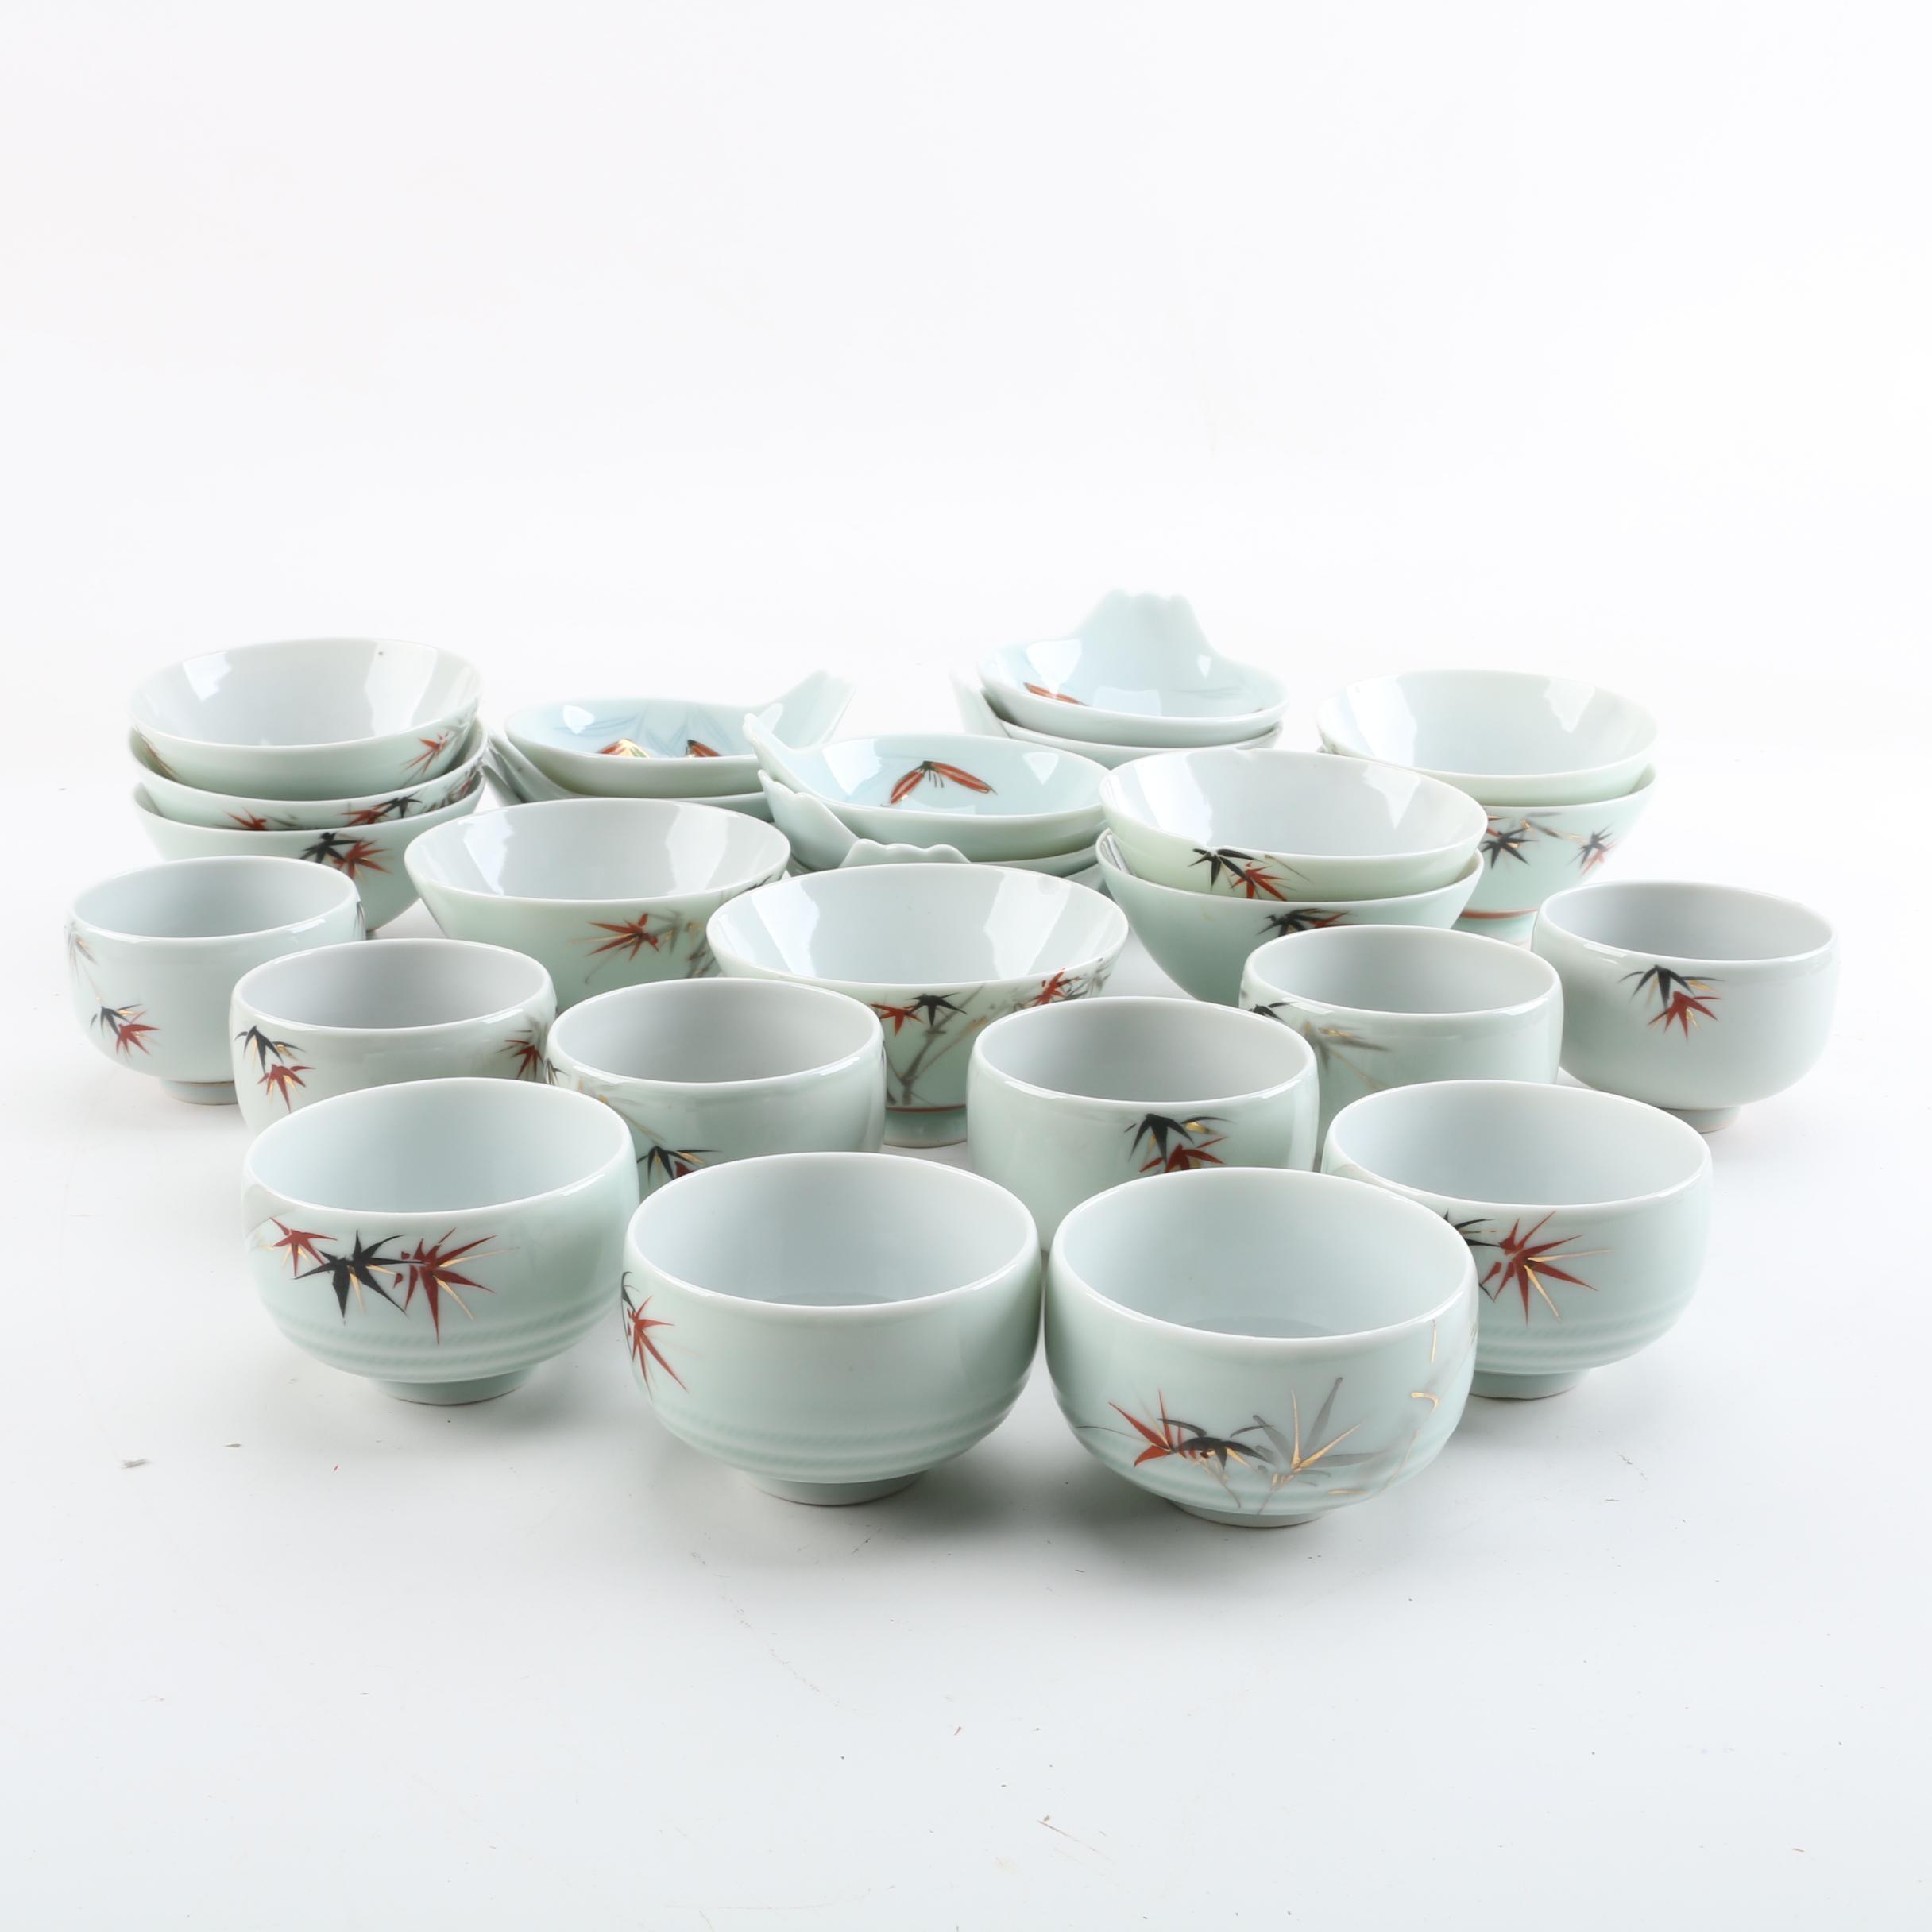 Asian Hand-Painted Bamboo Motif Porcelain Tableware